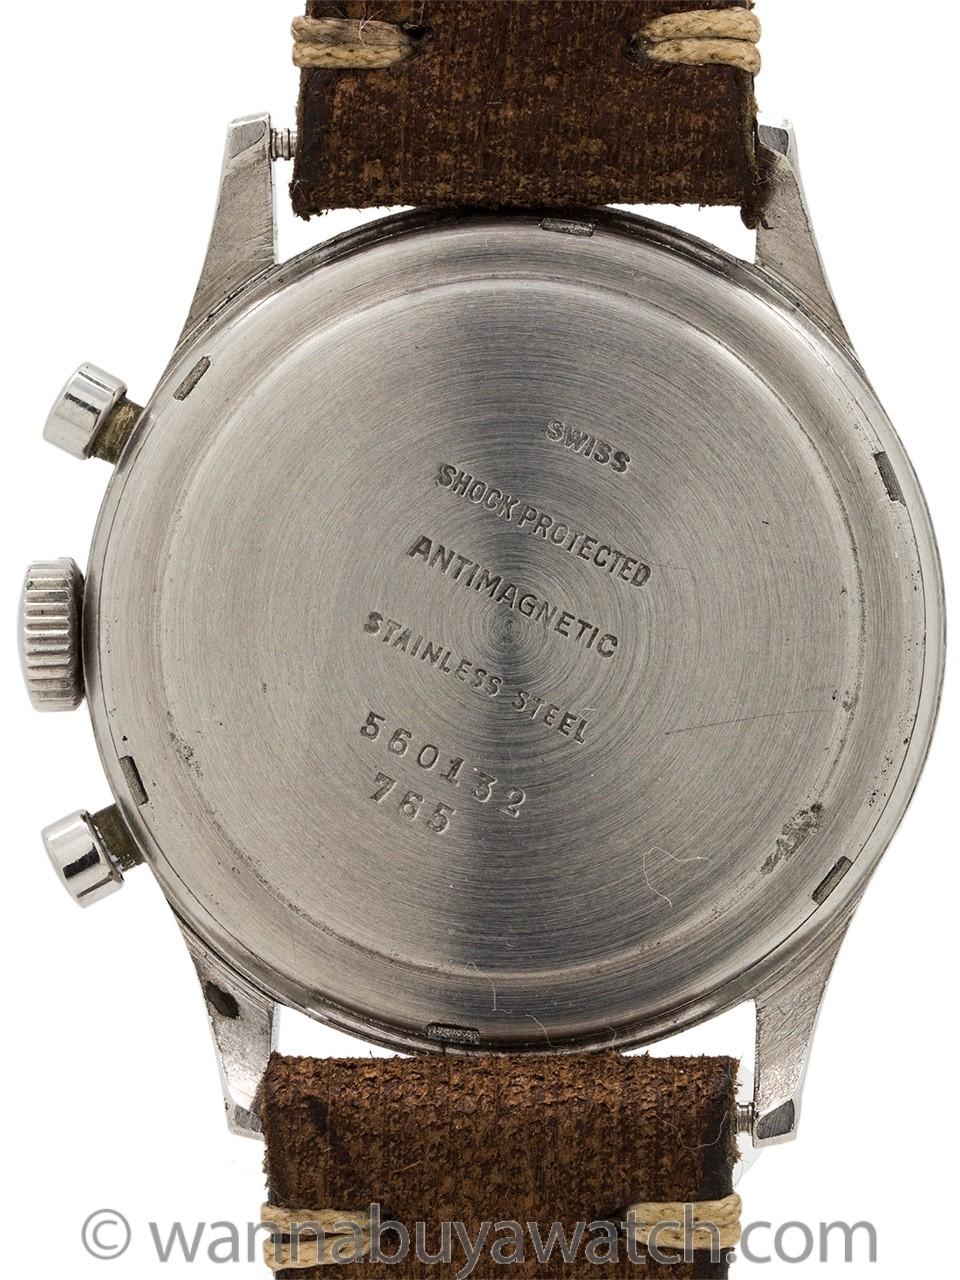 Welsbro Vintage Chronograph 38mm Venus 175 circa 1950's